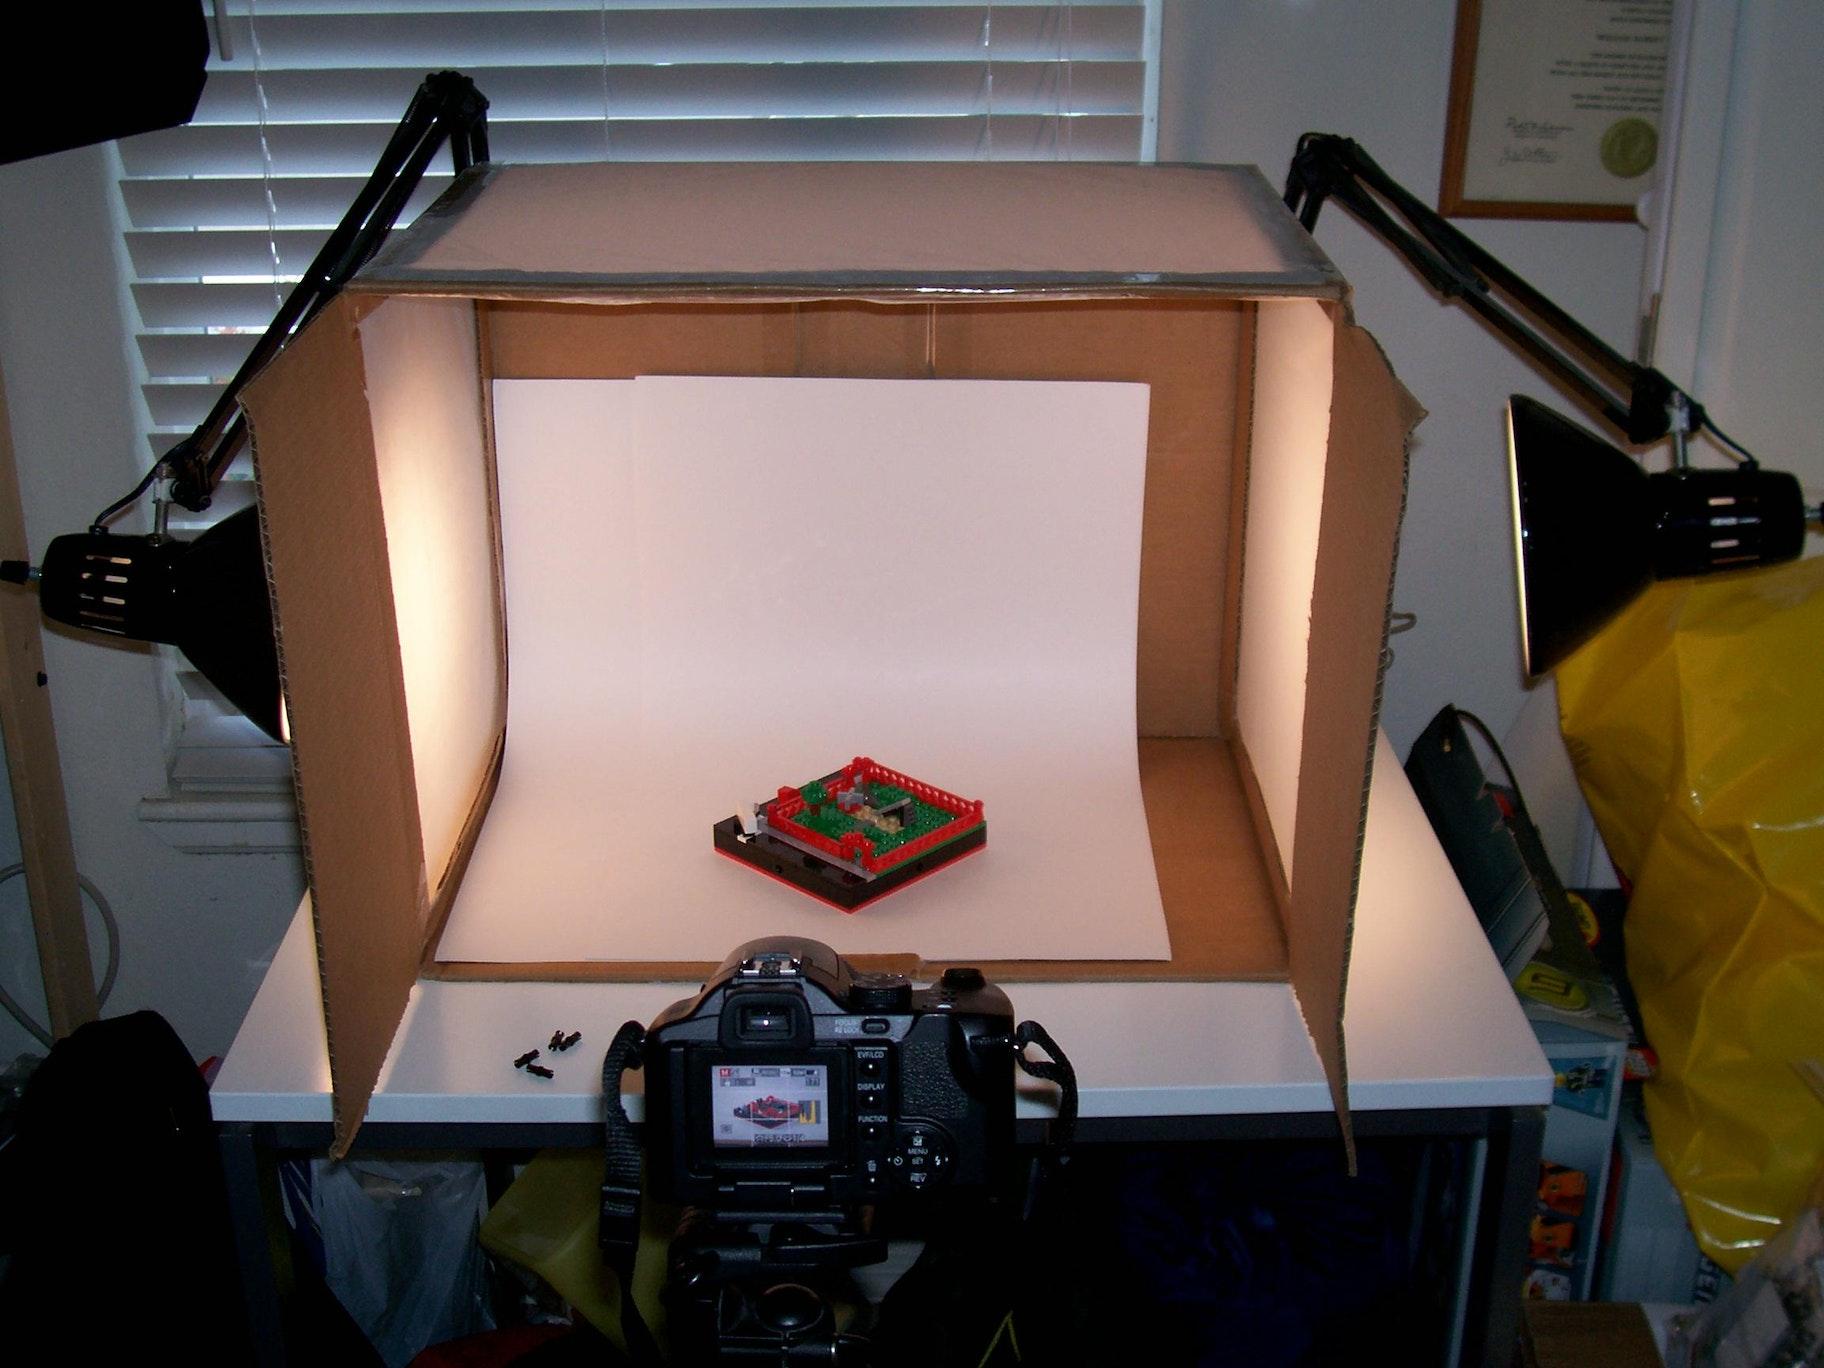 product photo lighting setup